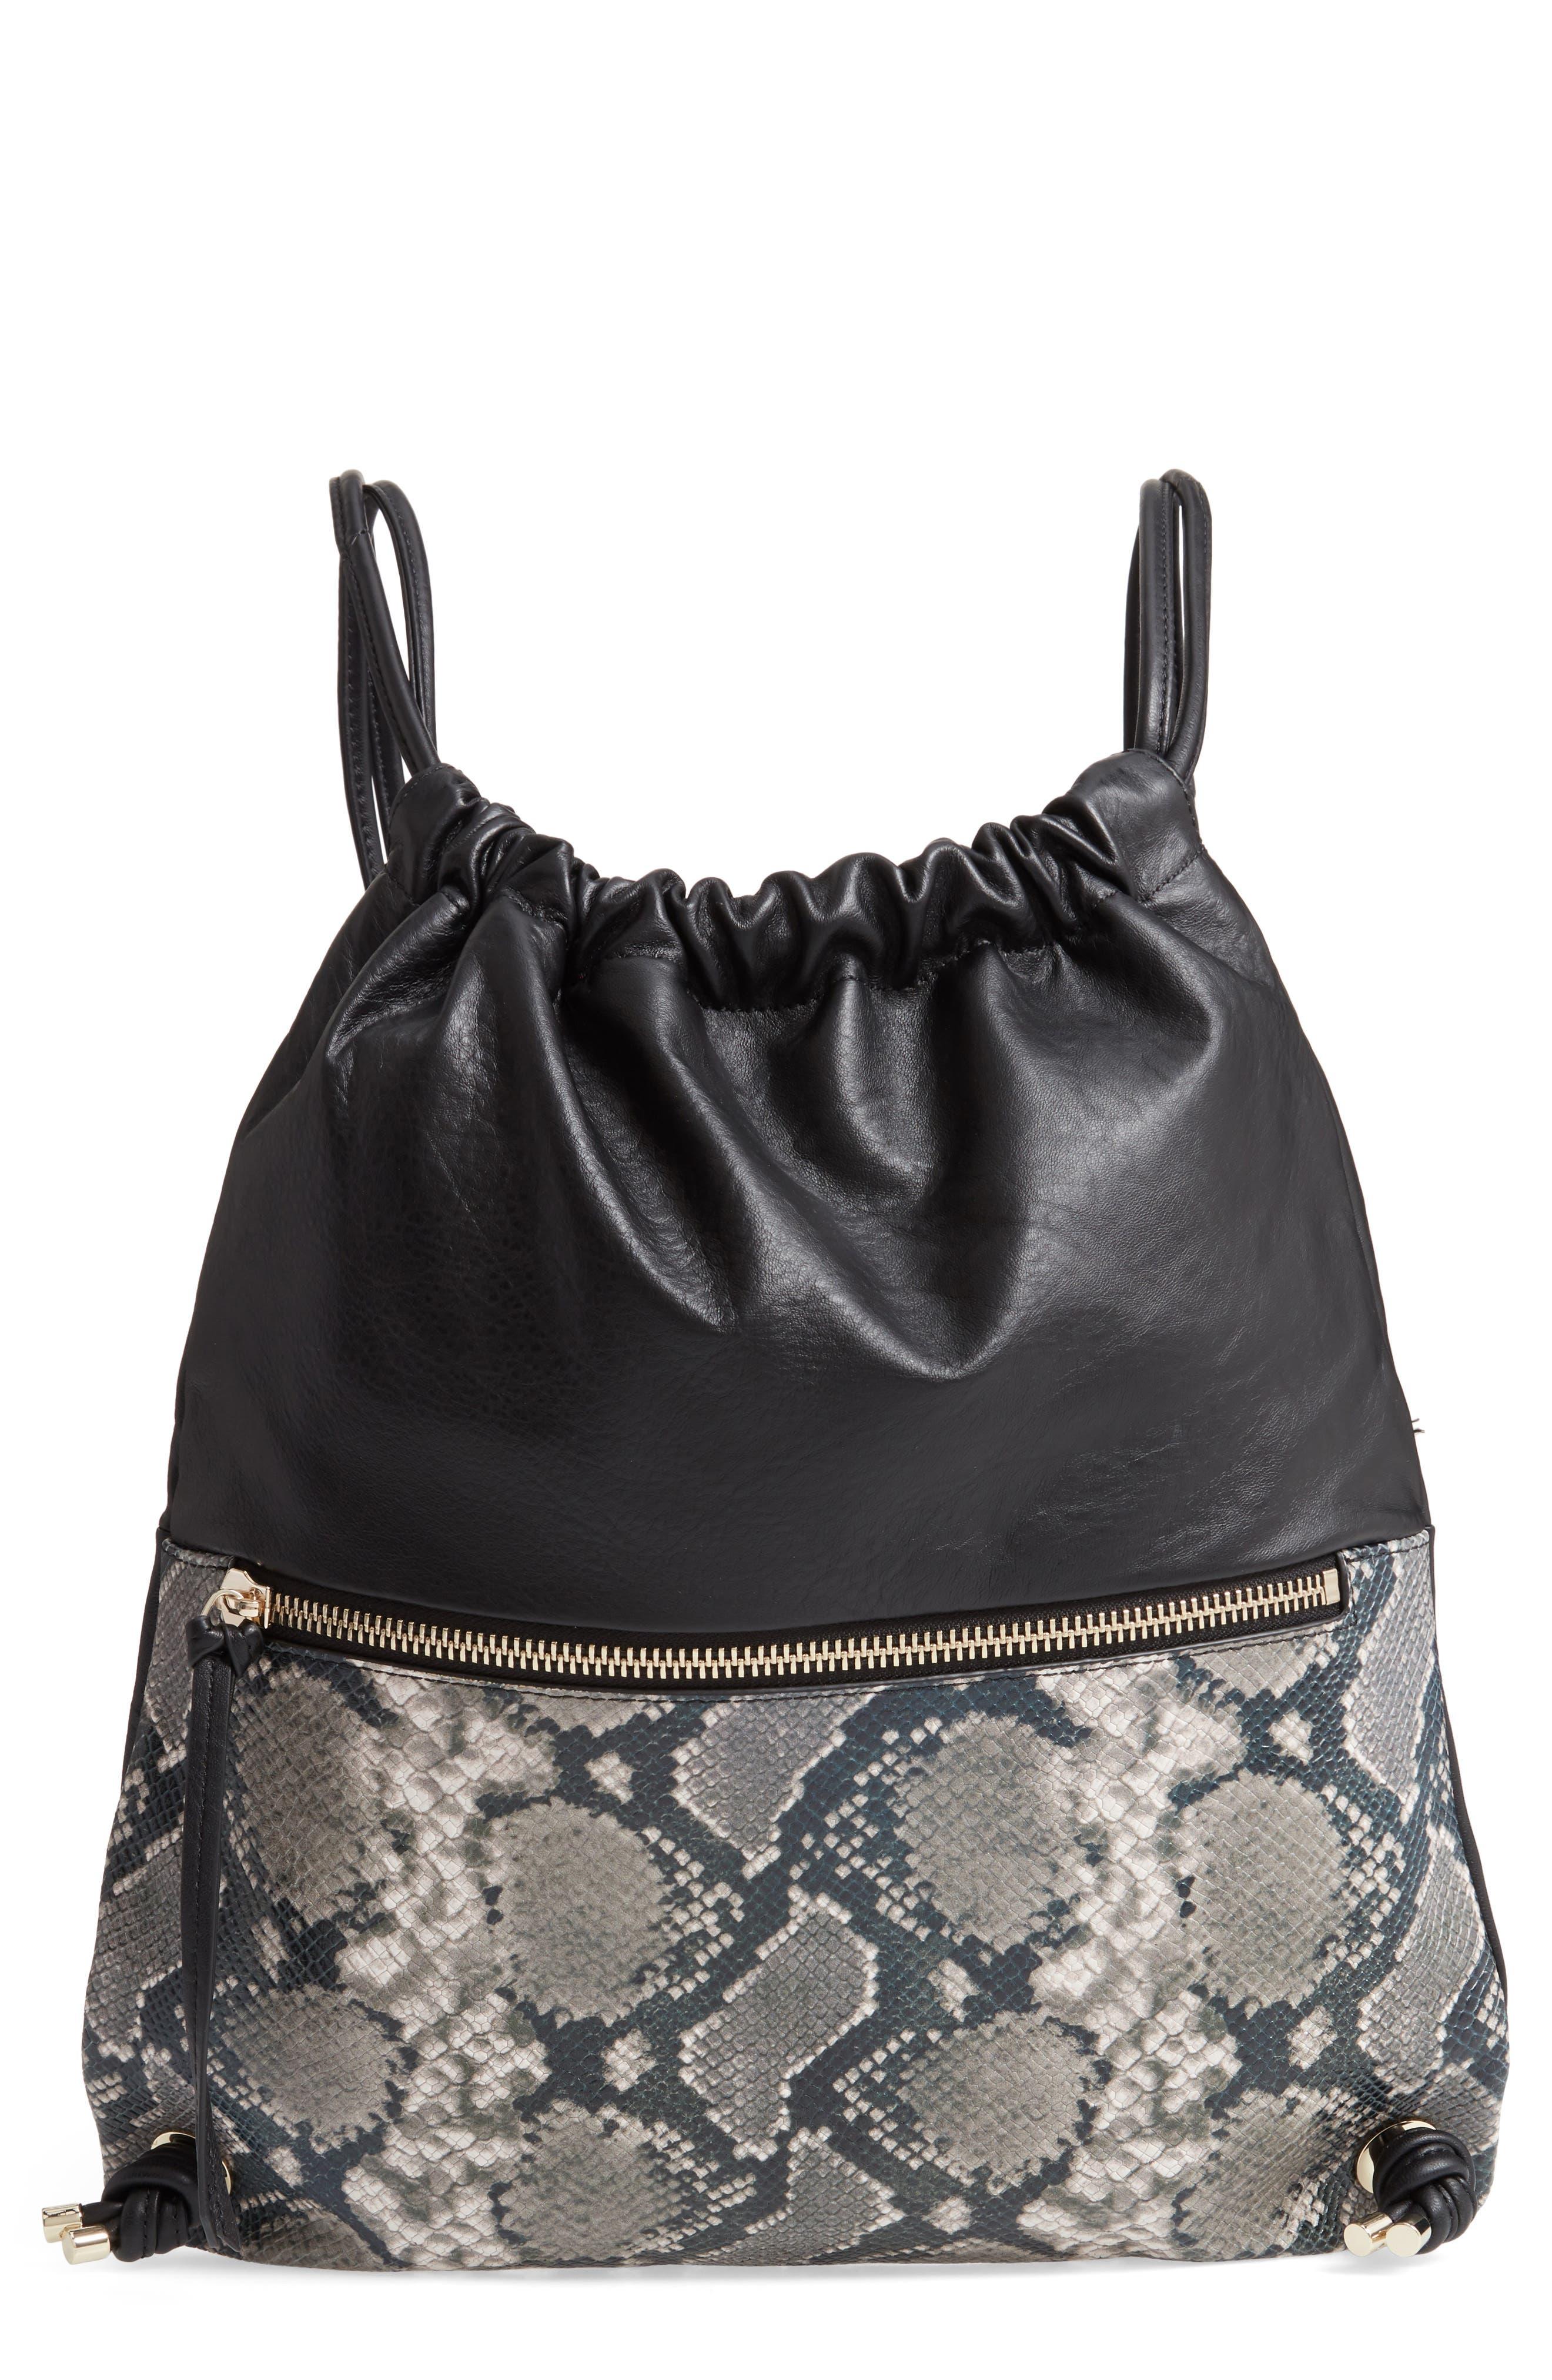 Kira Leather Backpack,                             Main thumbnail 1, color,                             BLACK